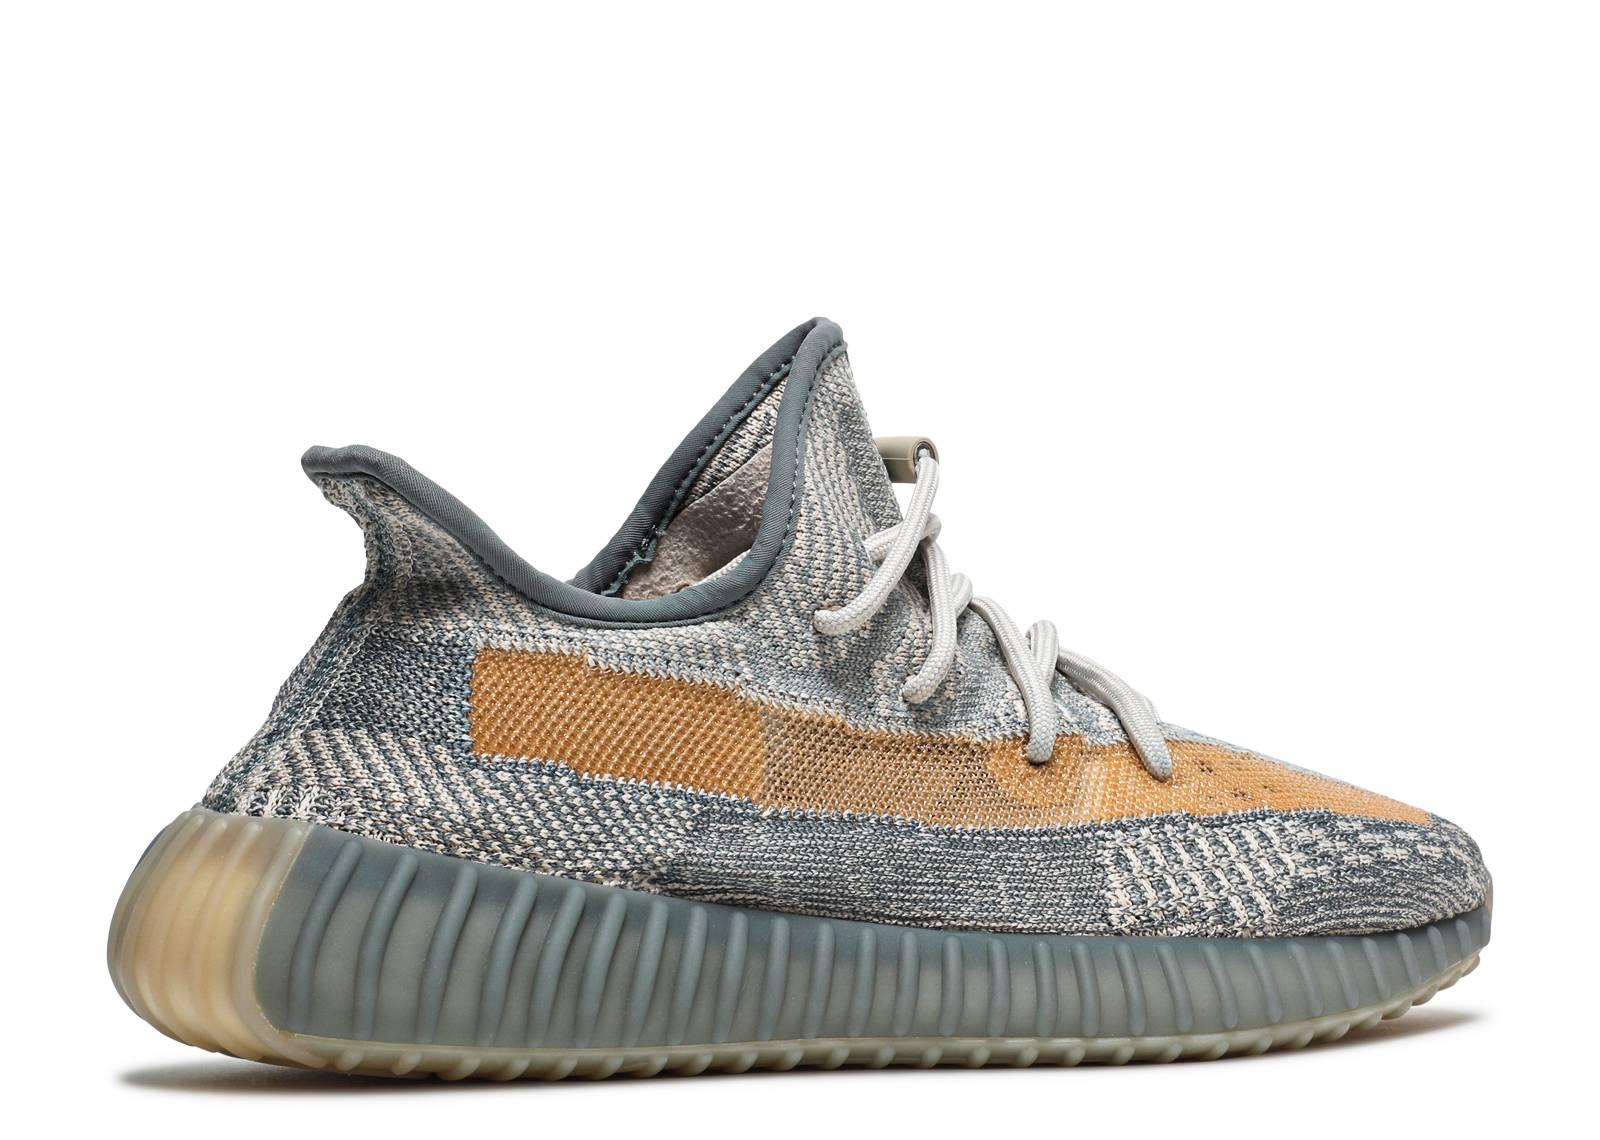 Yeezy Boost 350 V2 'Israfil' - Adidas